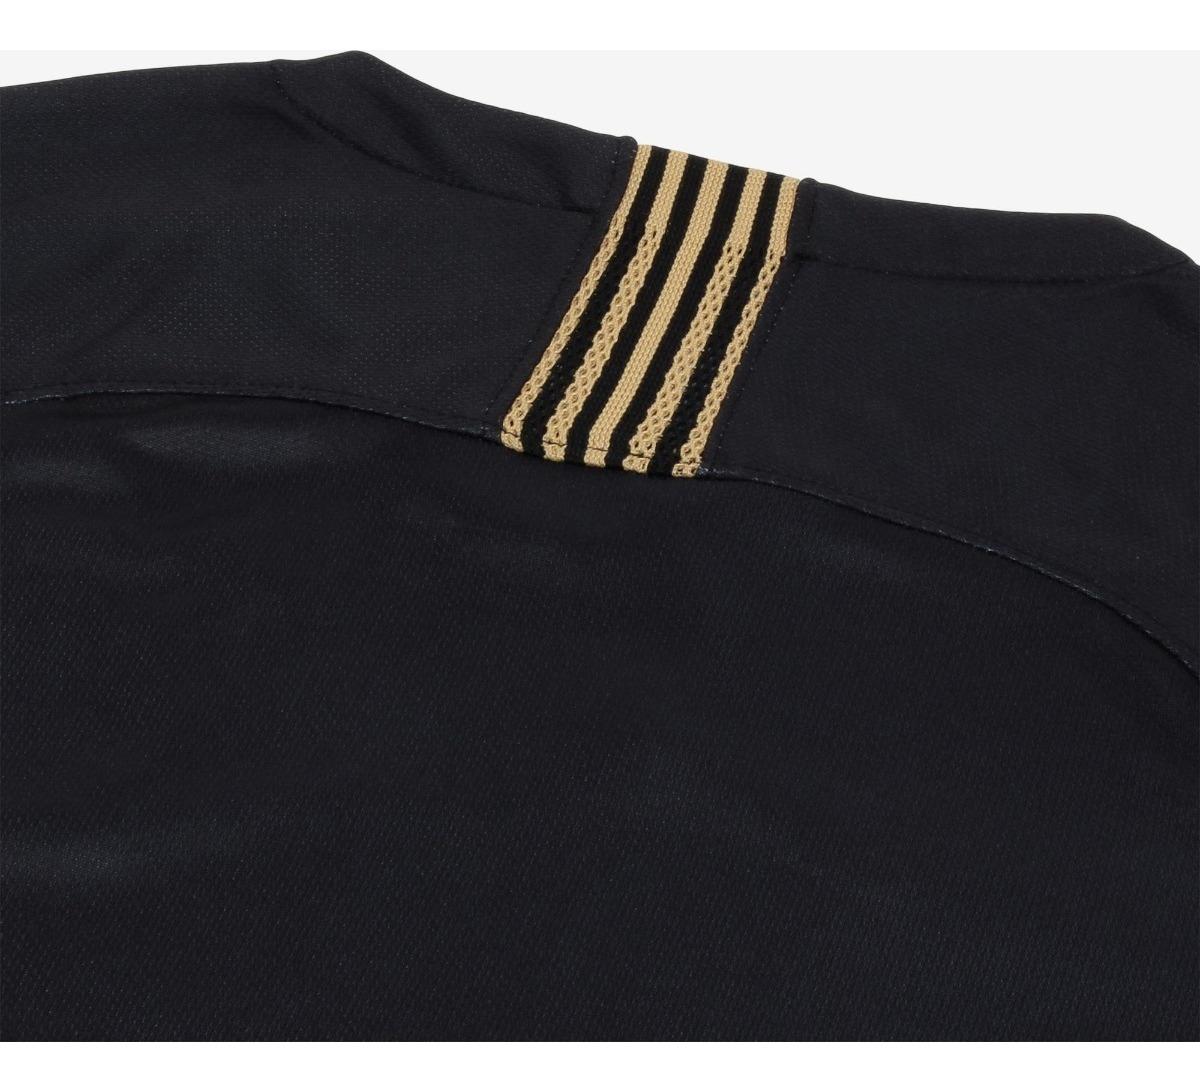 ea49016b7d Camisa Nike Corinthians Iii Ayrton Senna 18/19 + Nf - R$ 219,90 em ...